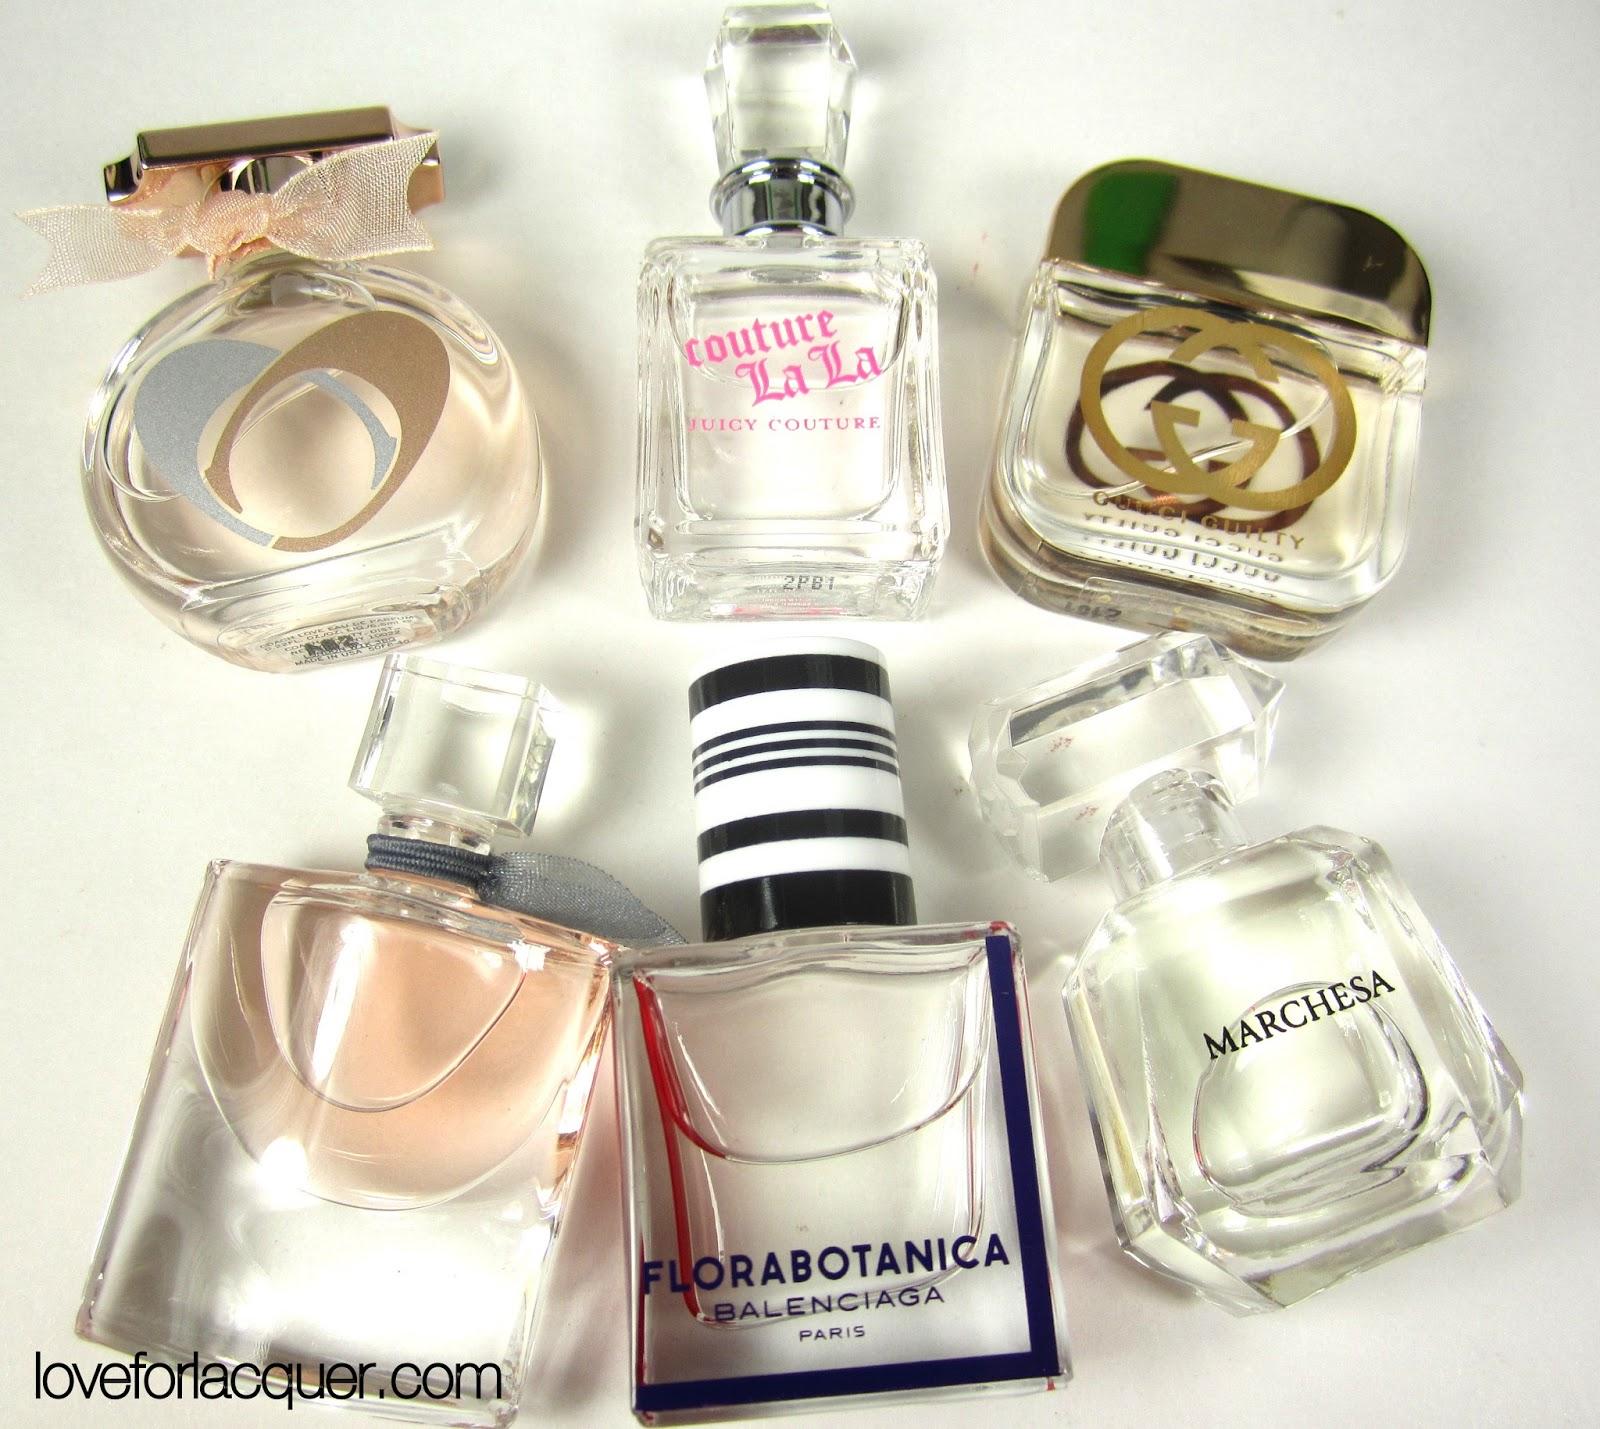 Bottled Dreams Sephora Fragrance Sampler For Her Mothers Day